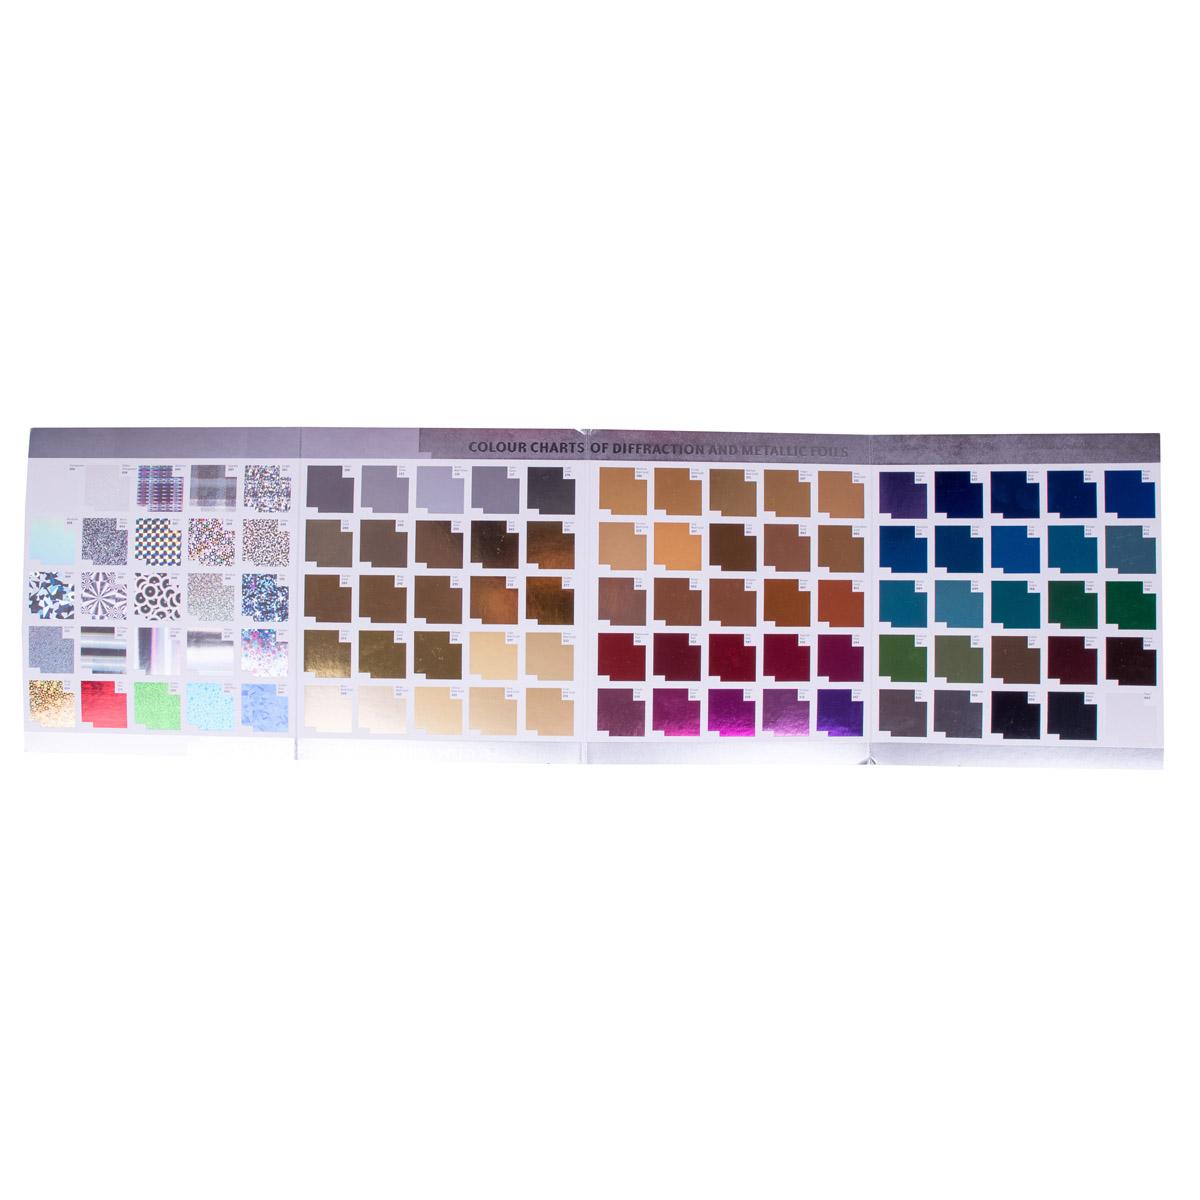 drukarnia katalog produktów